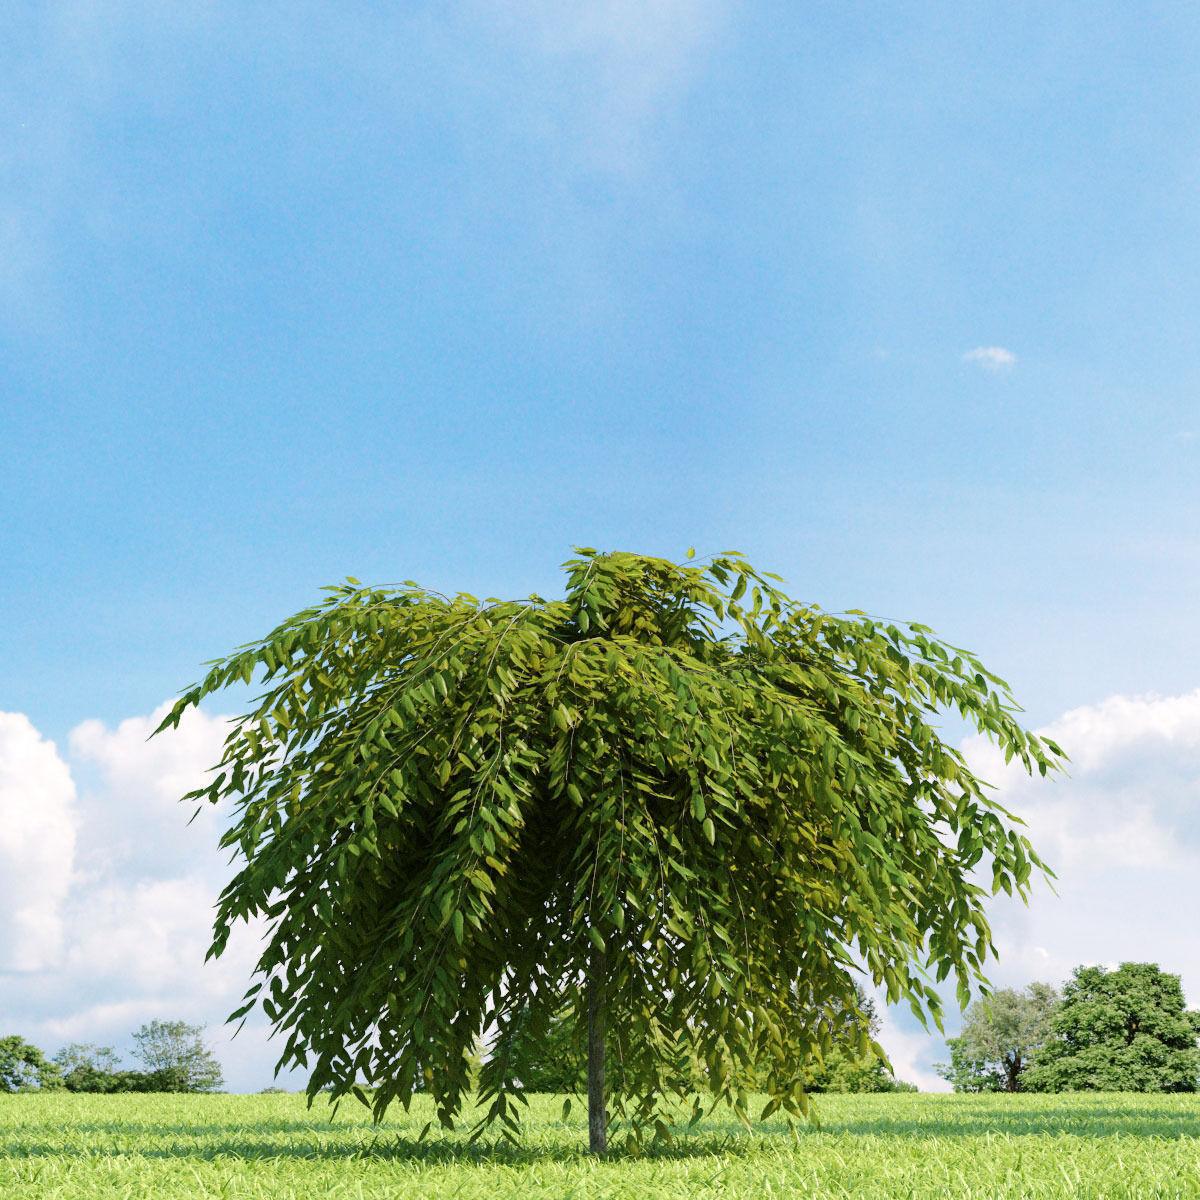 Salix repens var nitida 022 v3 AM136